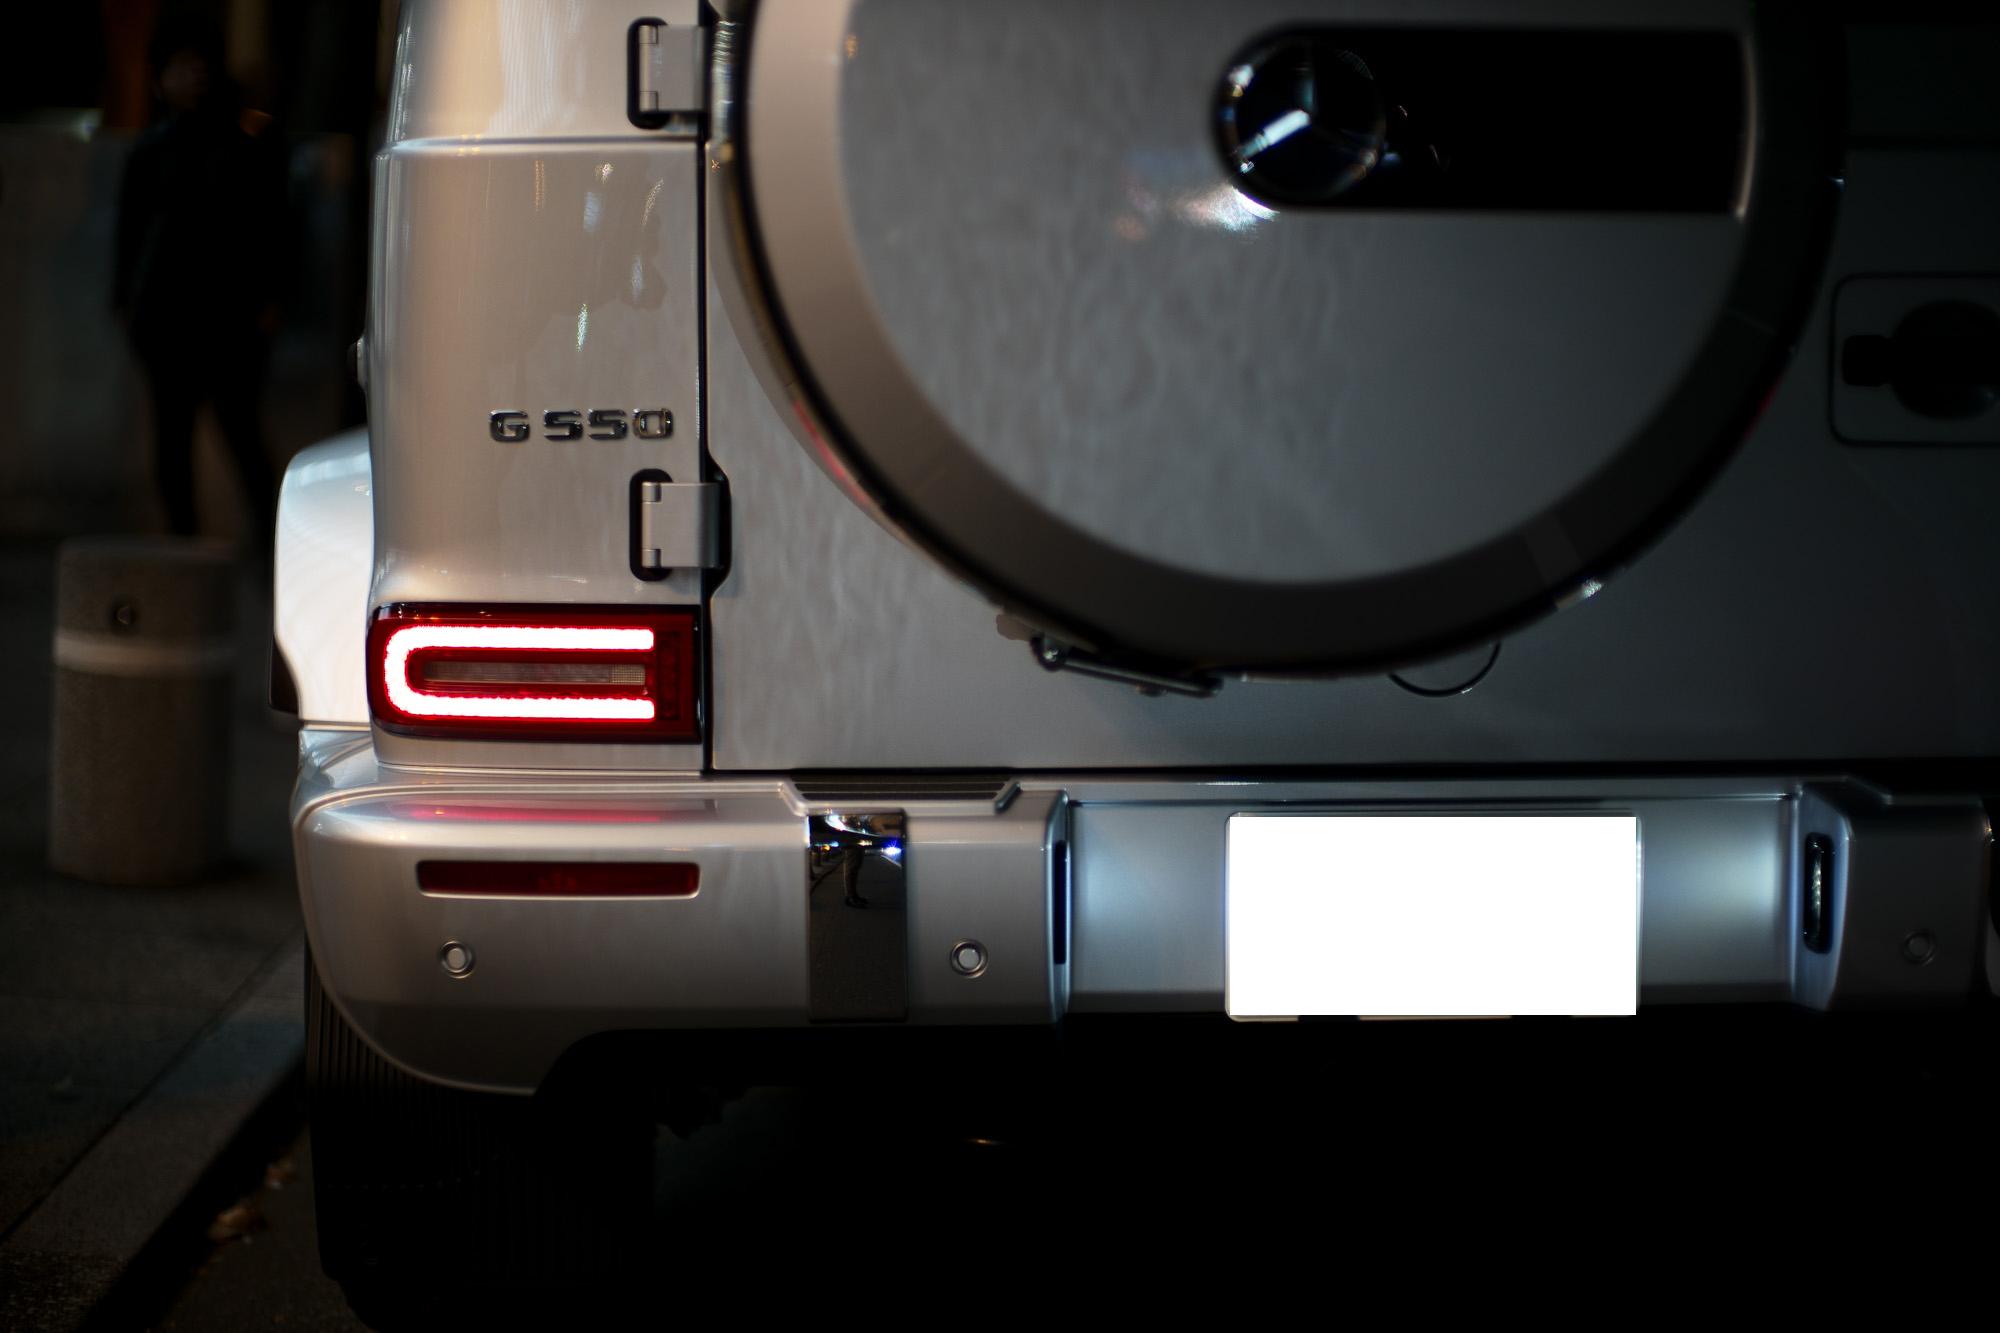 11/10 THE G-Class メルセデスベンツ Gクラス 新型 AMG G63 イリジウムシルバー 775 愛知 名古屋 altoediritto アルトエデリット